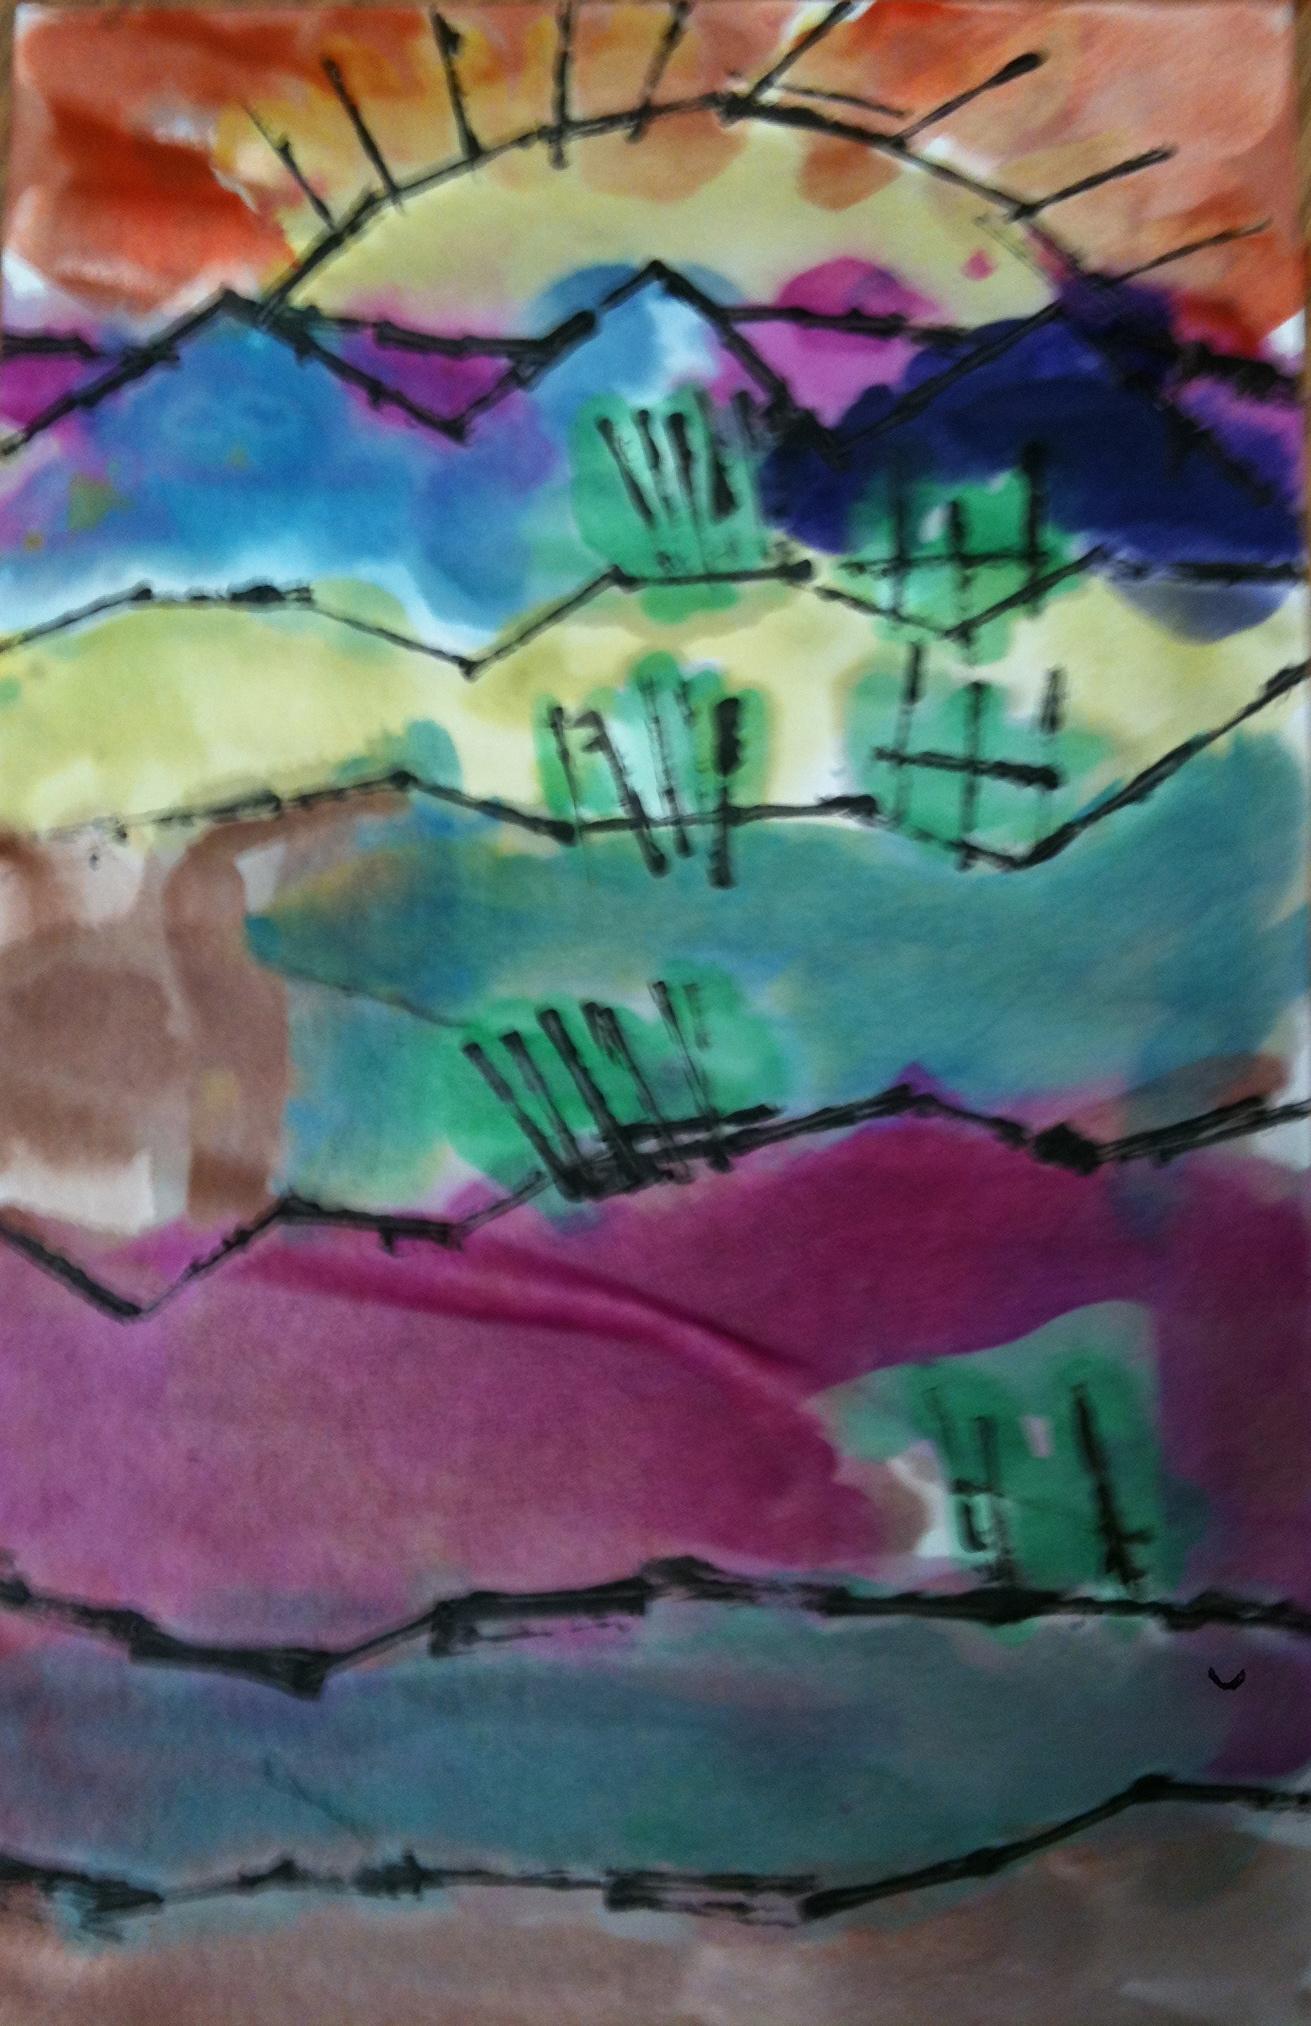 IMG_0456  Th Grade Art Landscape on 1st grade pumpkin art, 4th grade flowers, autumn landscape pumpkins art, 4th grade dance, 4th grade craft, volcano landscape art, 4th grade perspective landscapes, 4th grade impressionism, 4th grade home, 4th grade artwork, 4th grade sculpture, 4th grade portraits, 4th grade collage, home landscape art, 4th grade still life, 4th grade printmaking, 4th grade watercolor, 4th grade design, winter christmas tree art, 4th grade painting lessons,